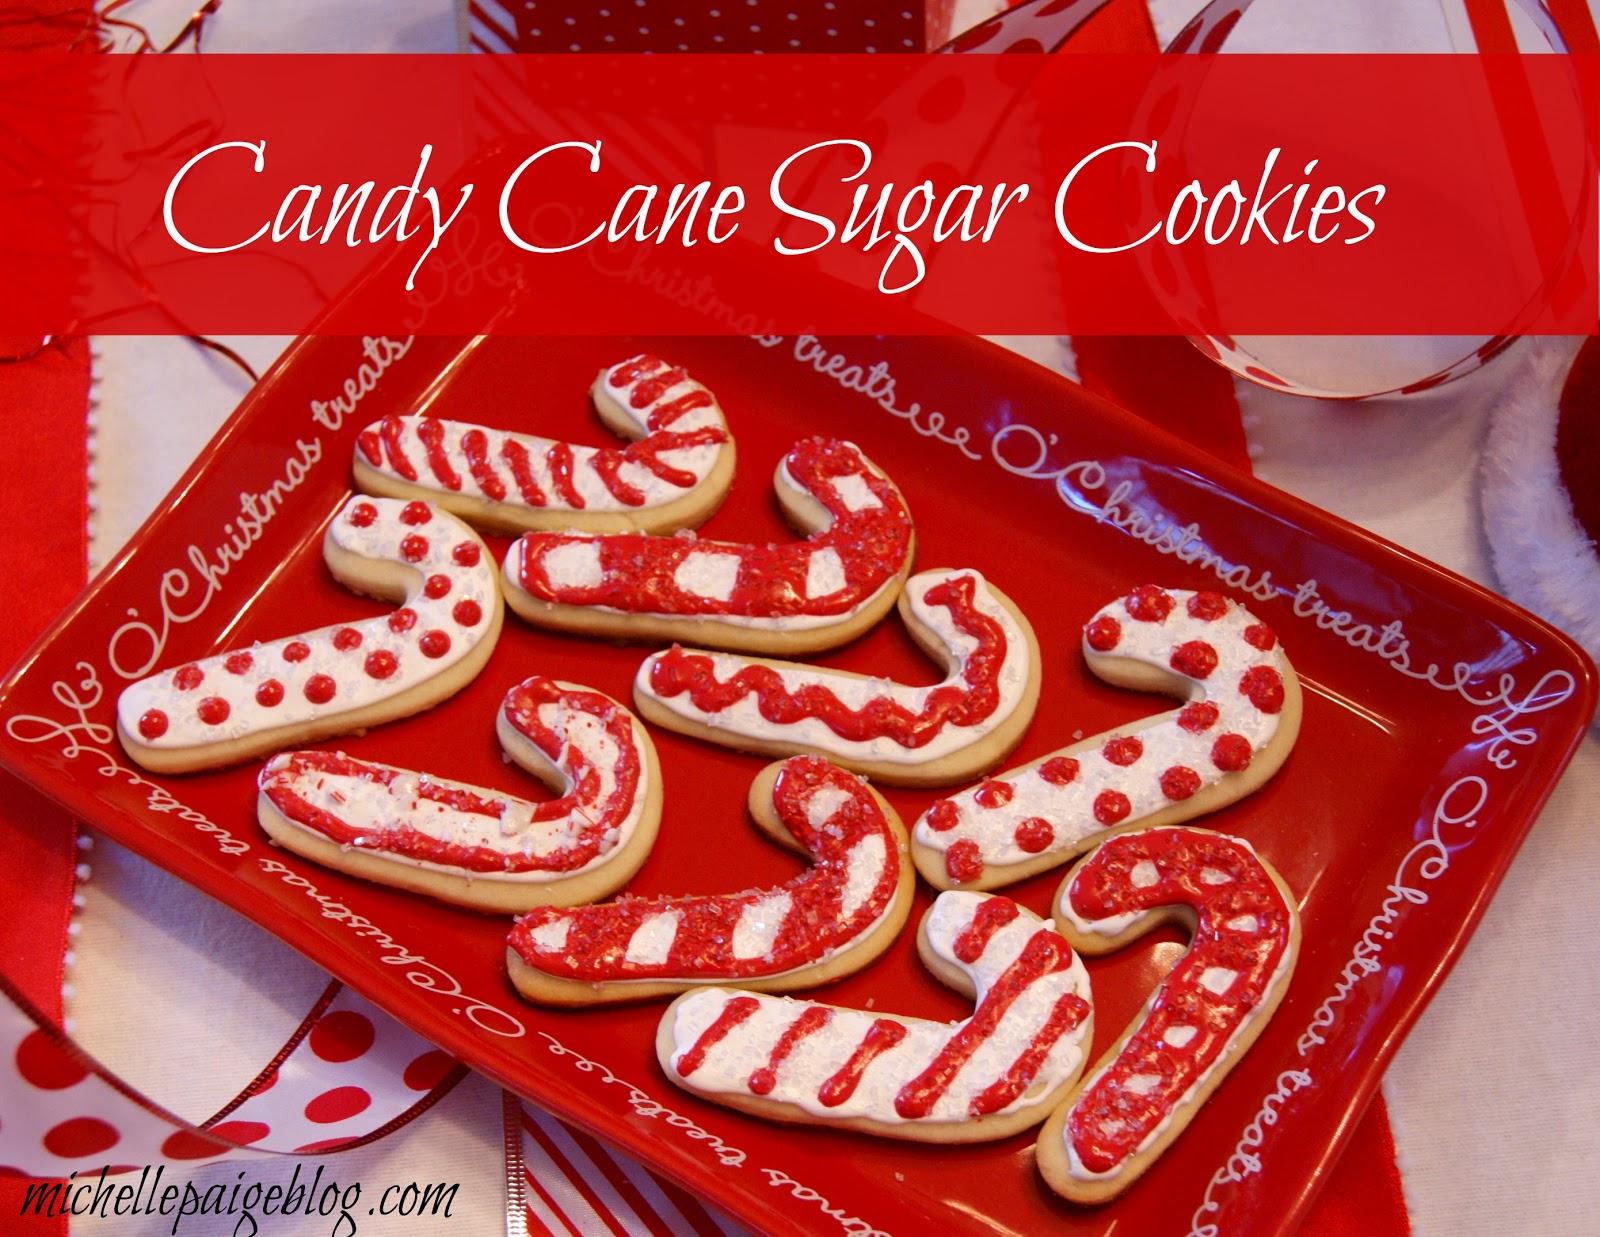 Michelle Paige Blogs Candy Cane Sugar Cookies